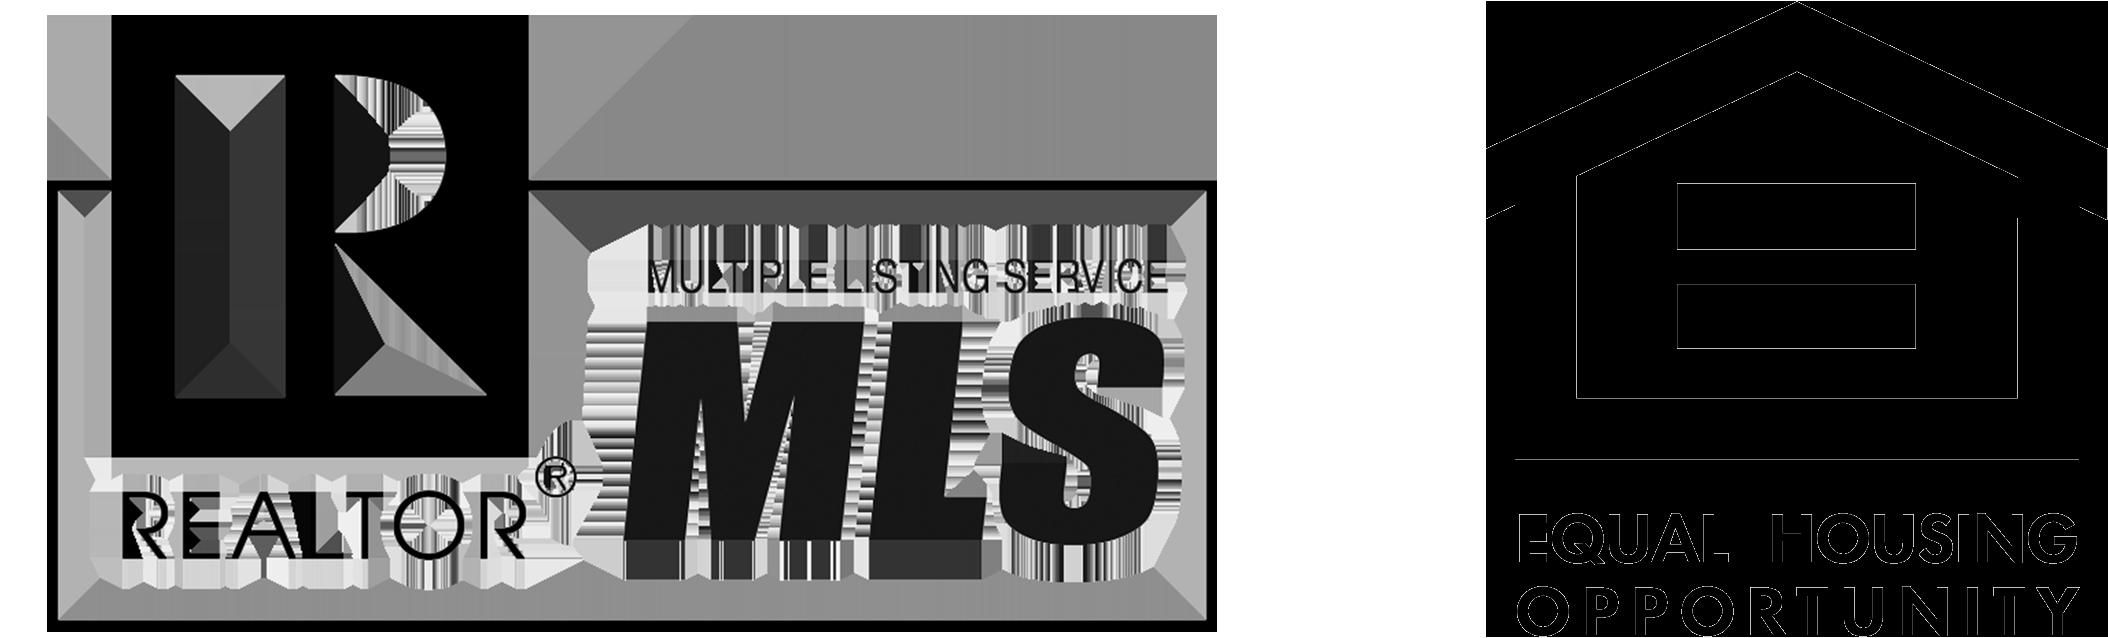 Realtor_MLS_Logo-3c28a76653dbc495f98ea52937aab069.png